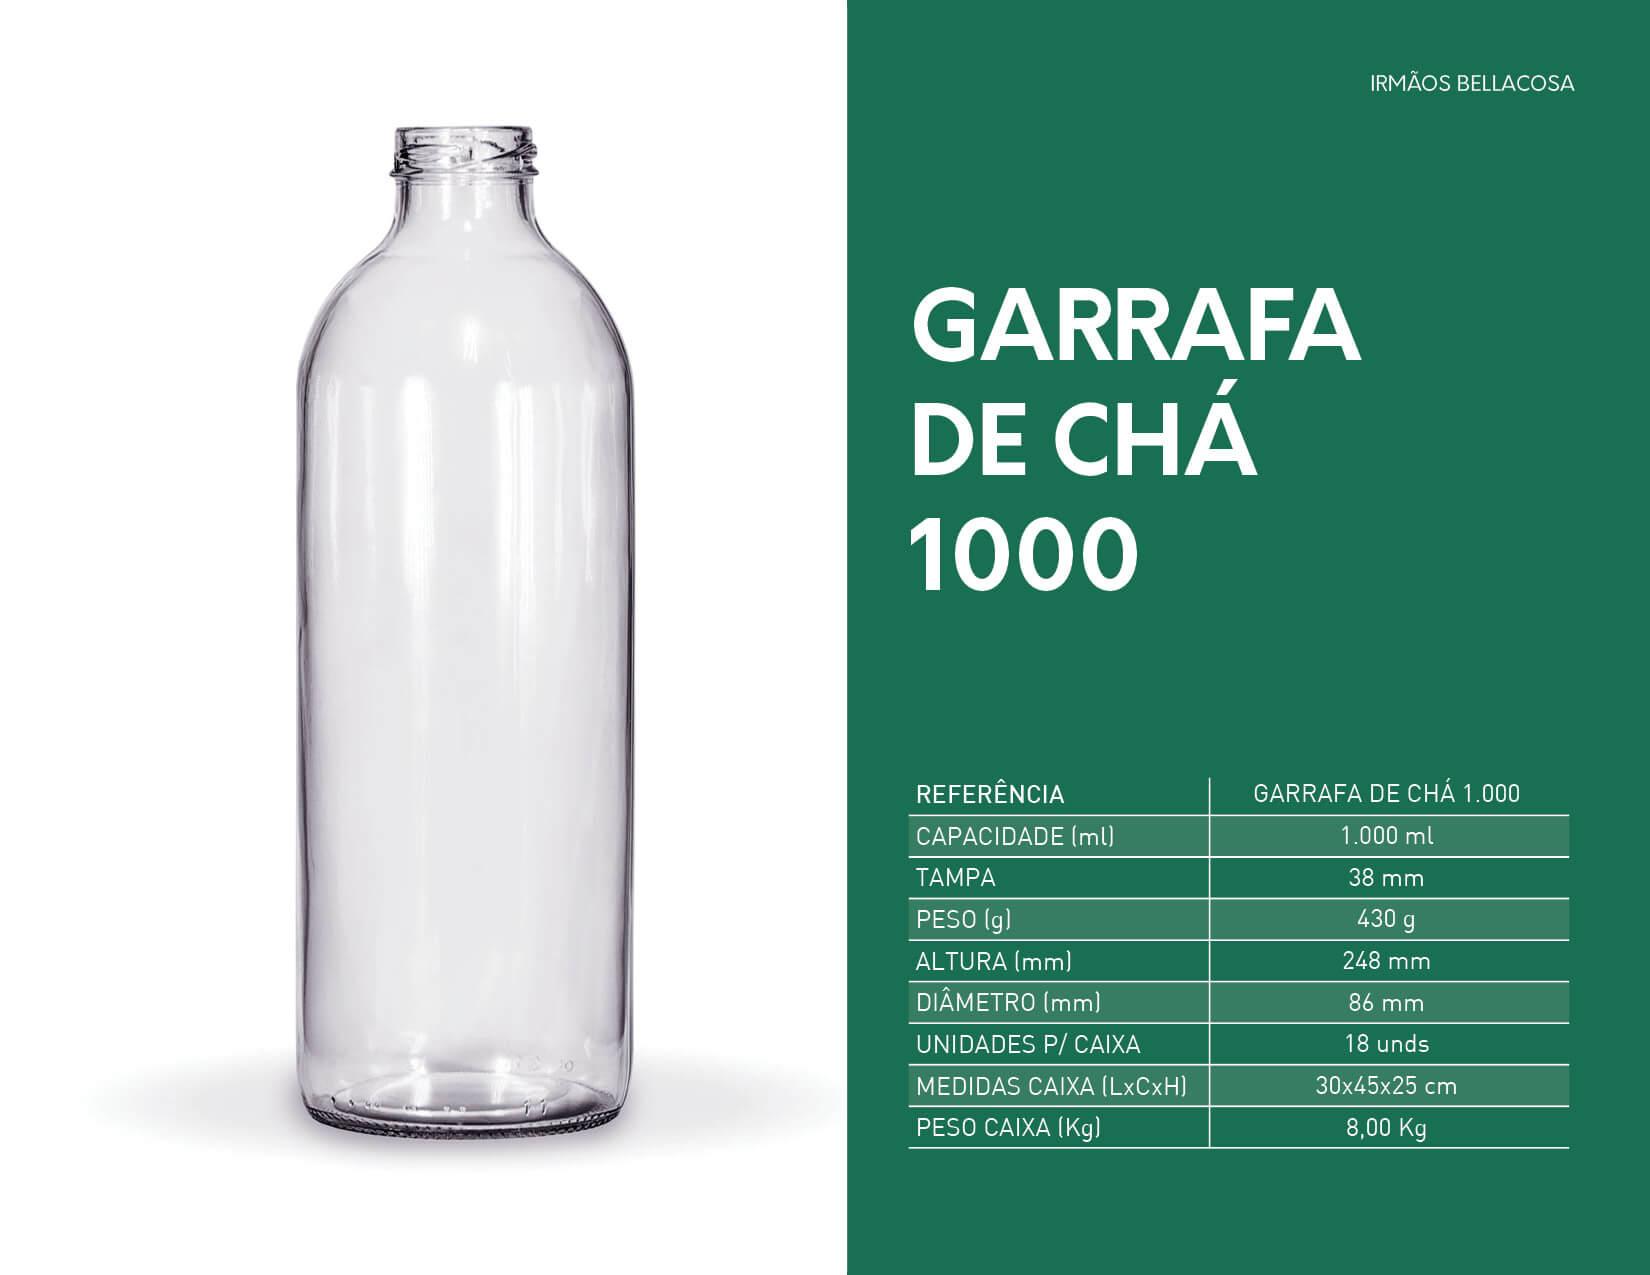 043-Garrafa-de-cha-1000-irmaos-bellacosa-embalagens-de-vidro